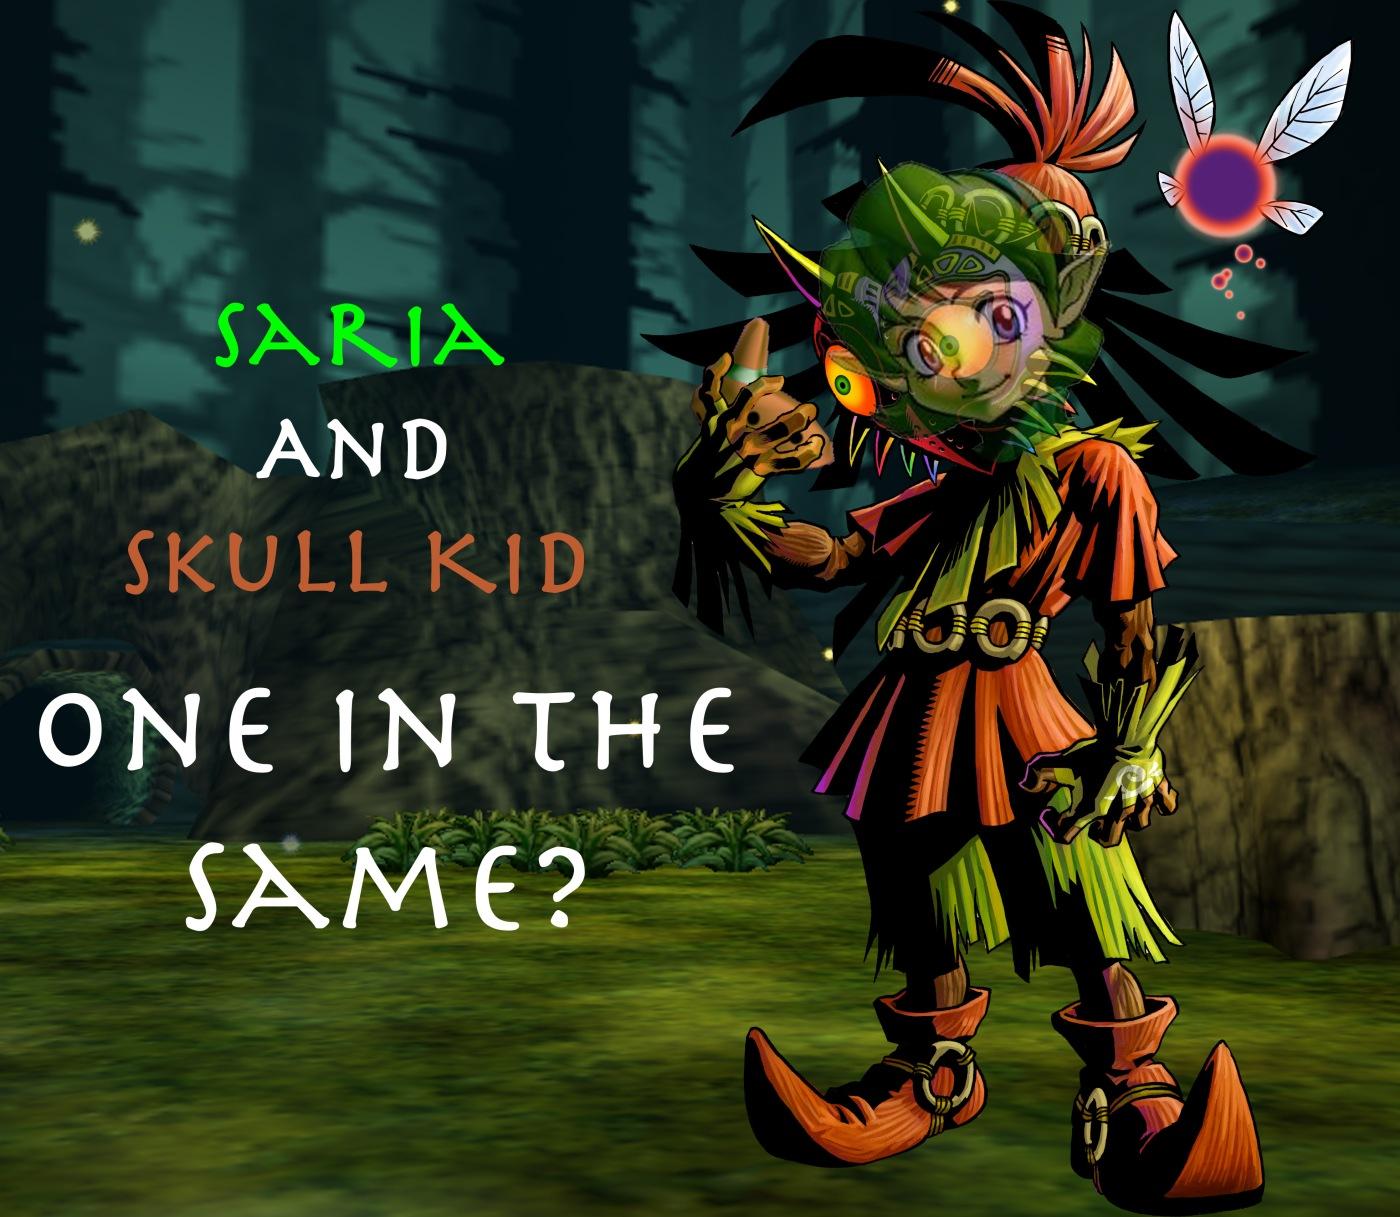 Skull_kid Saria